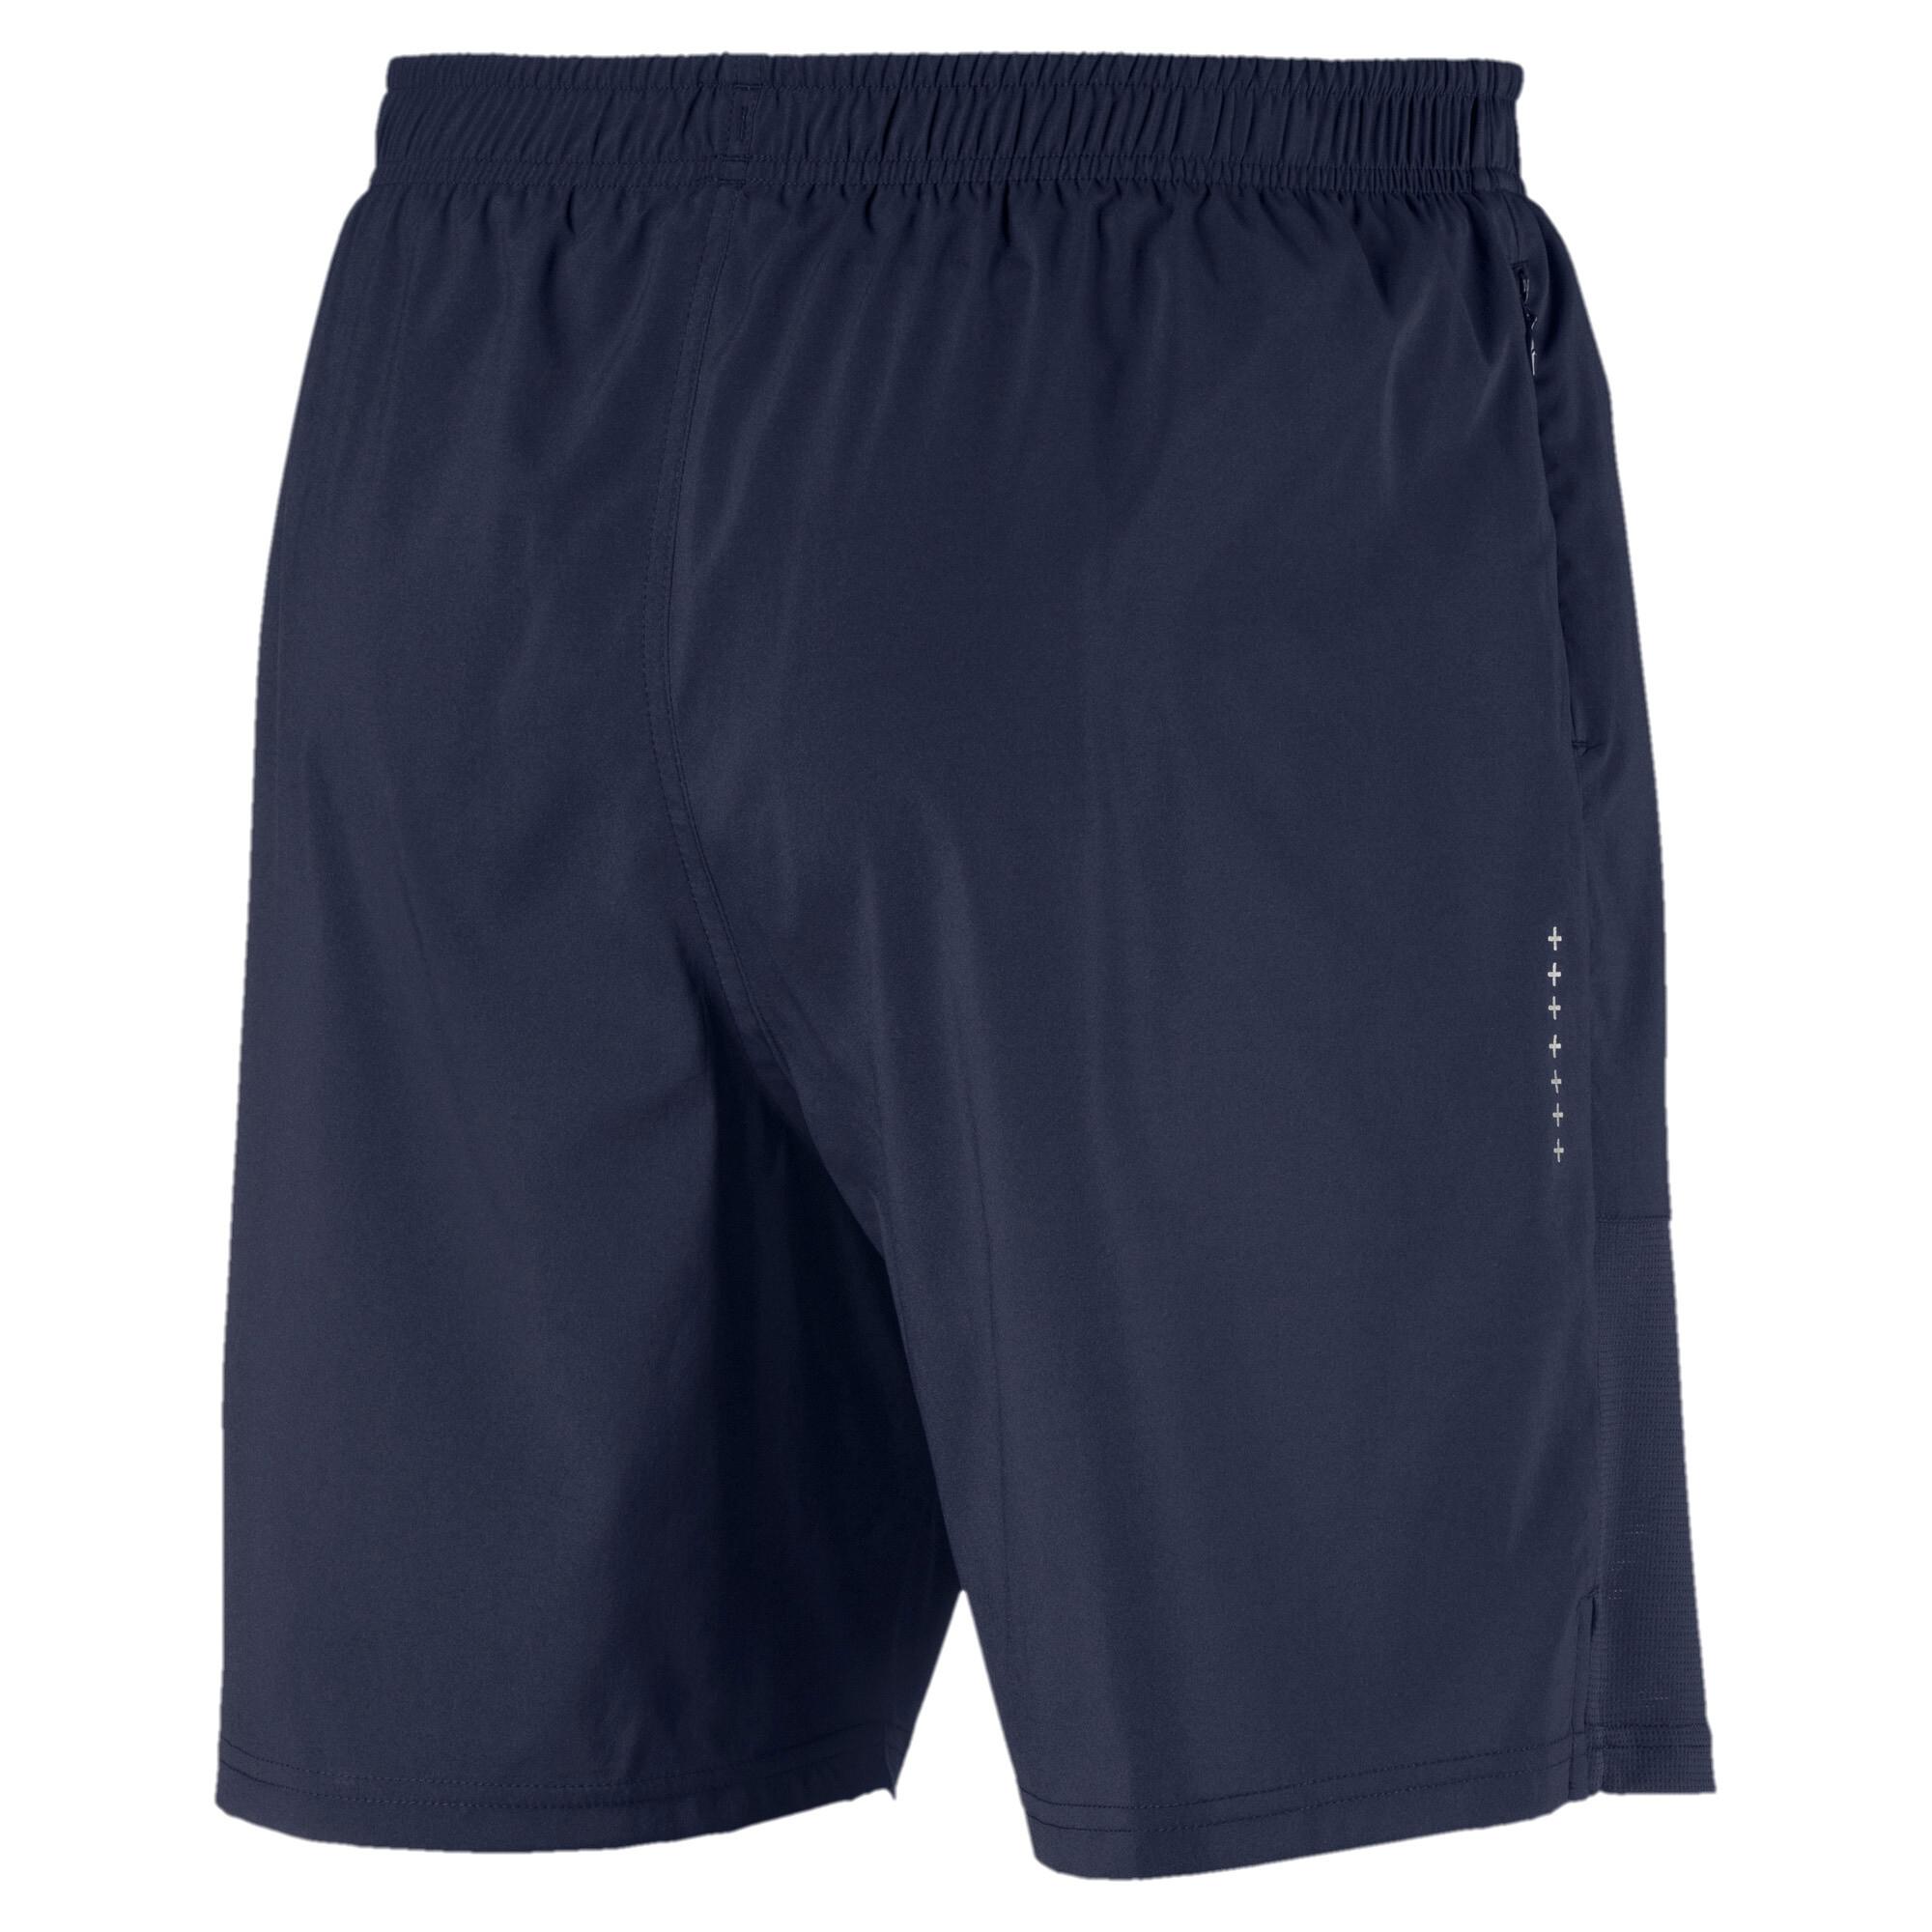 Image Puma Running Men's IGNITE Shorts #2